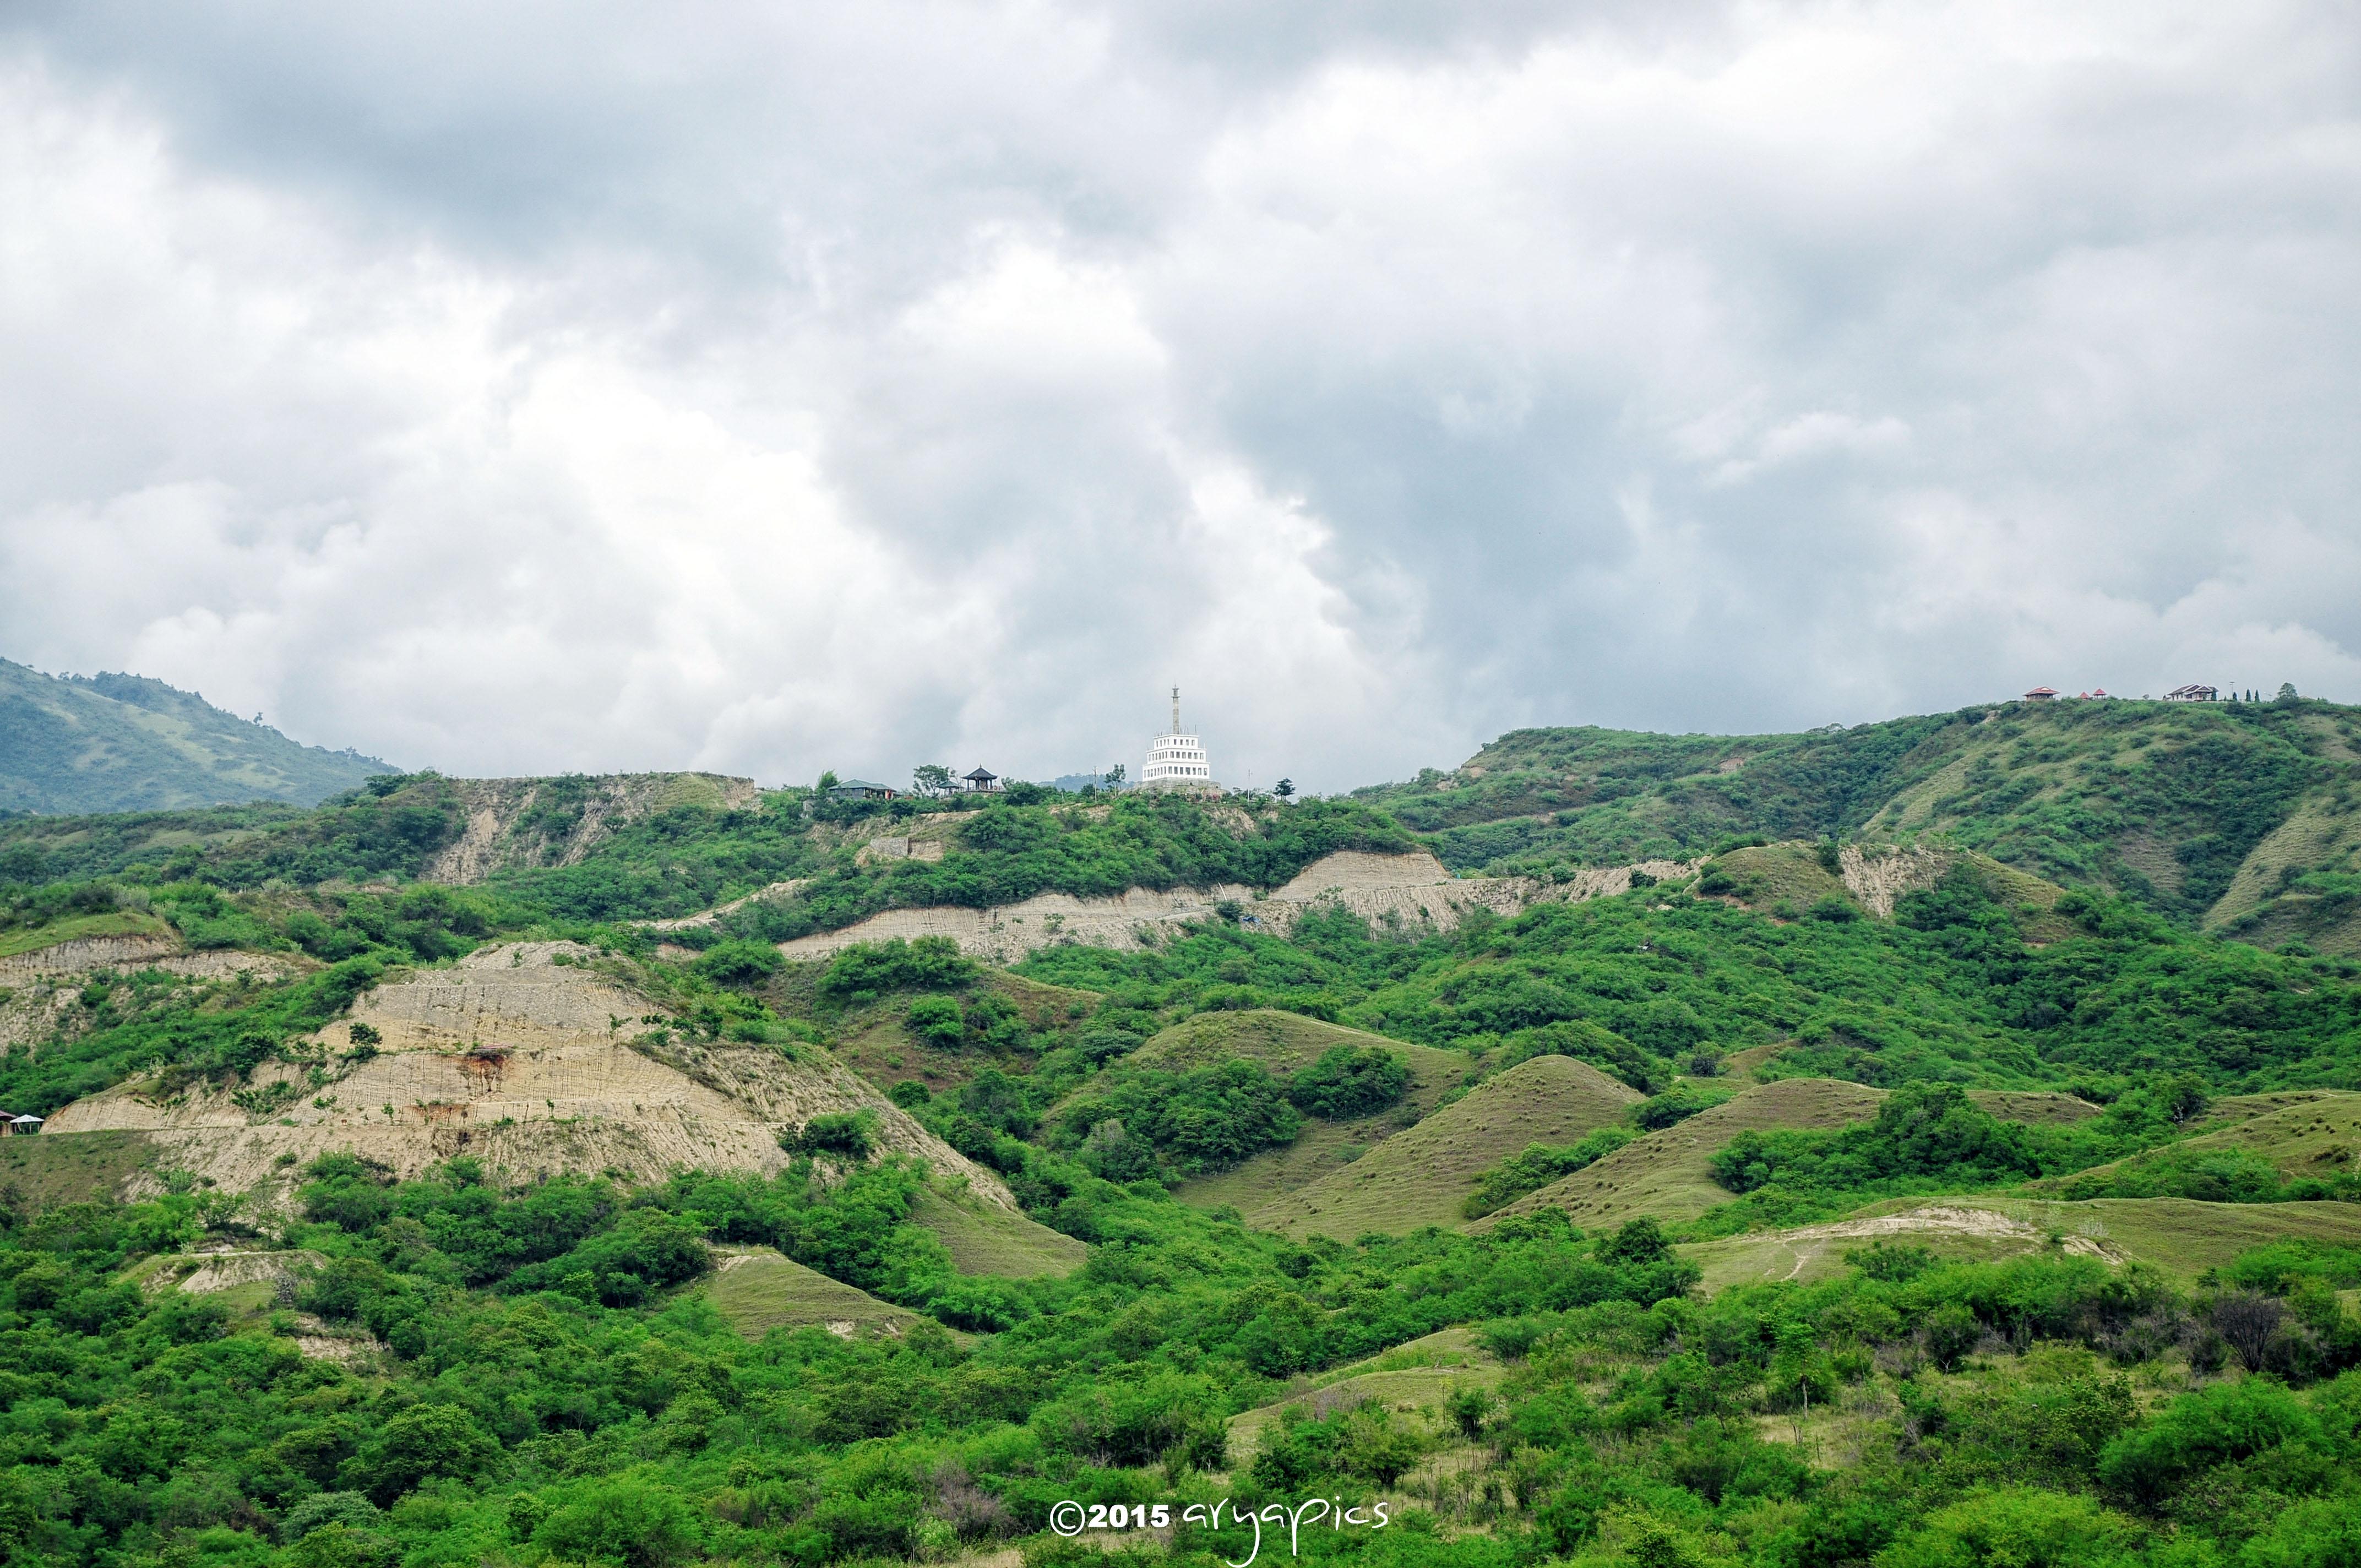 Menatap Dekat Tugu Perdamaian Nosarara Nosabatutu Topanjayo Kejauhan Kota Palu